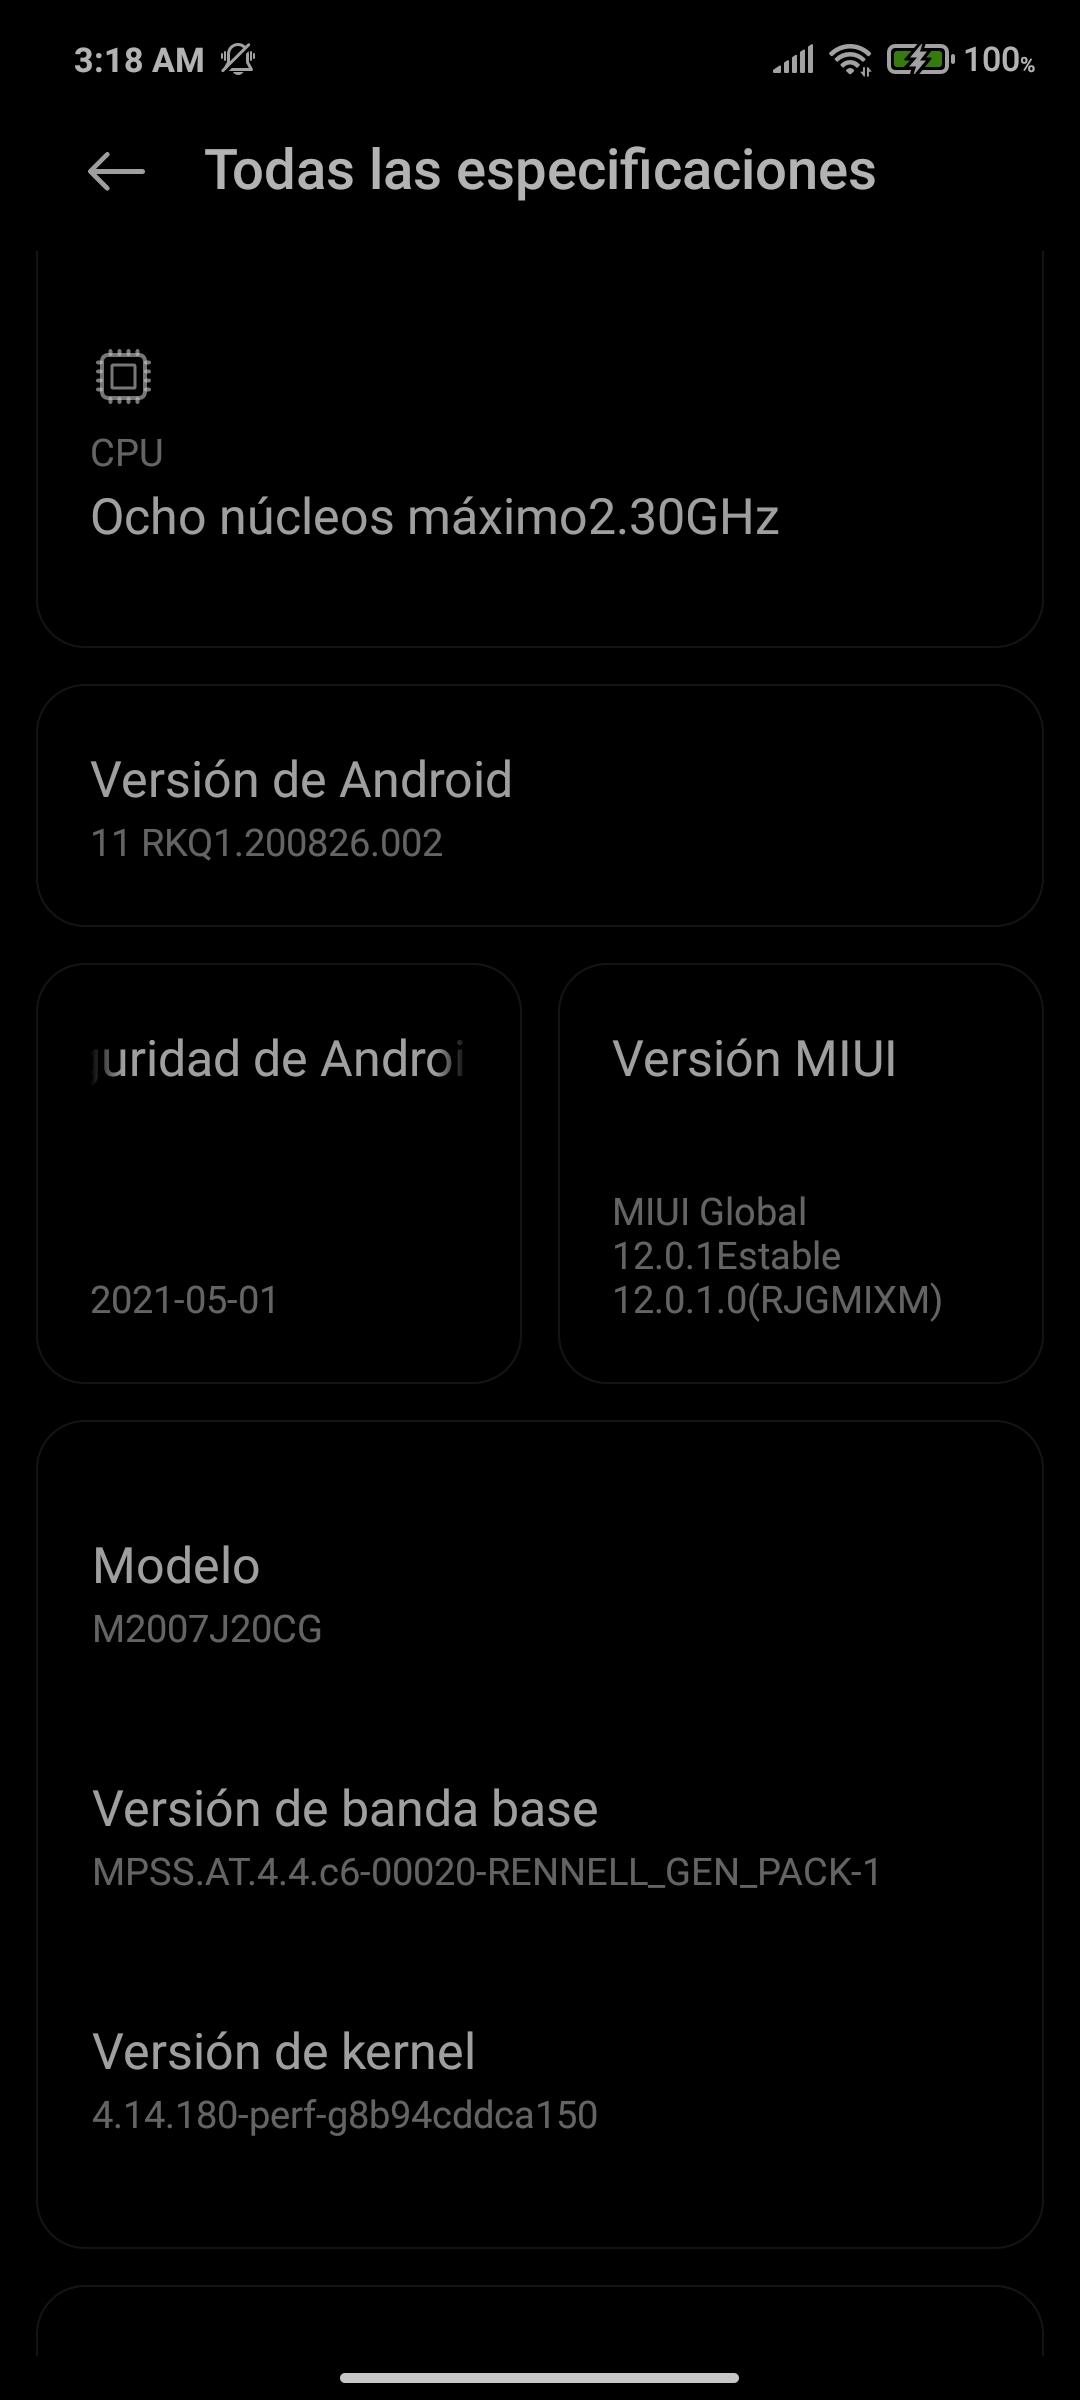 Screenshot_2021-06-22-03-18-01-074_com.android.settings.jpg